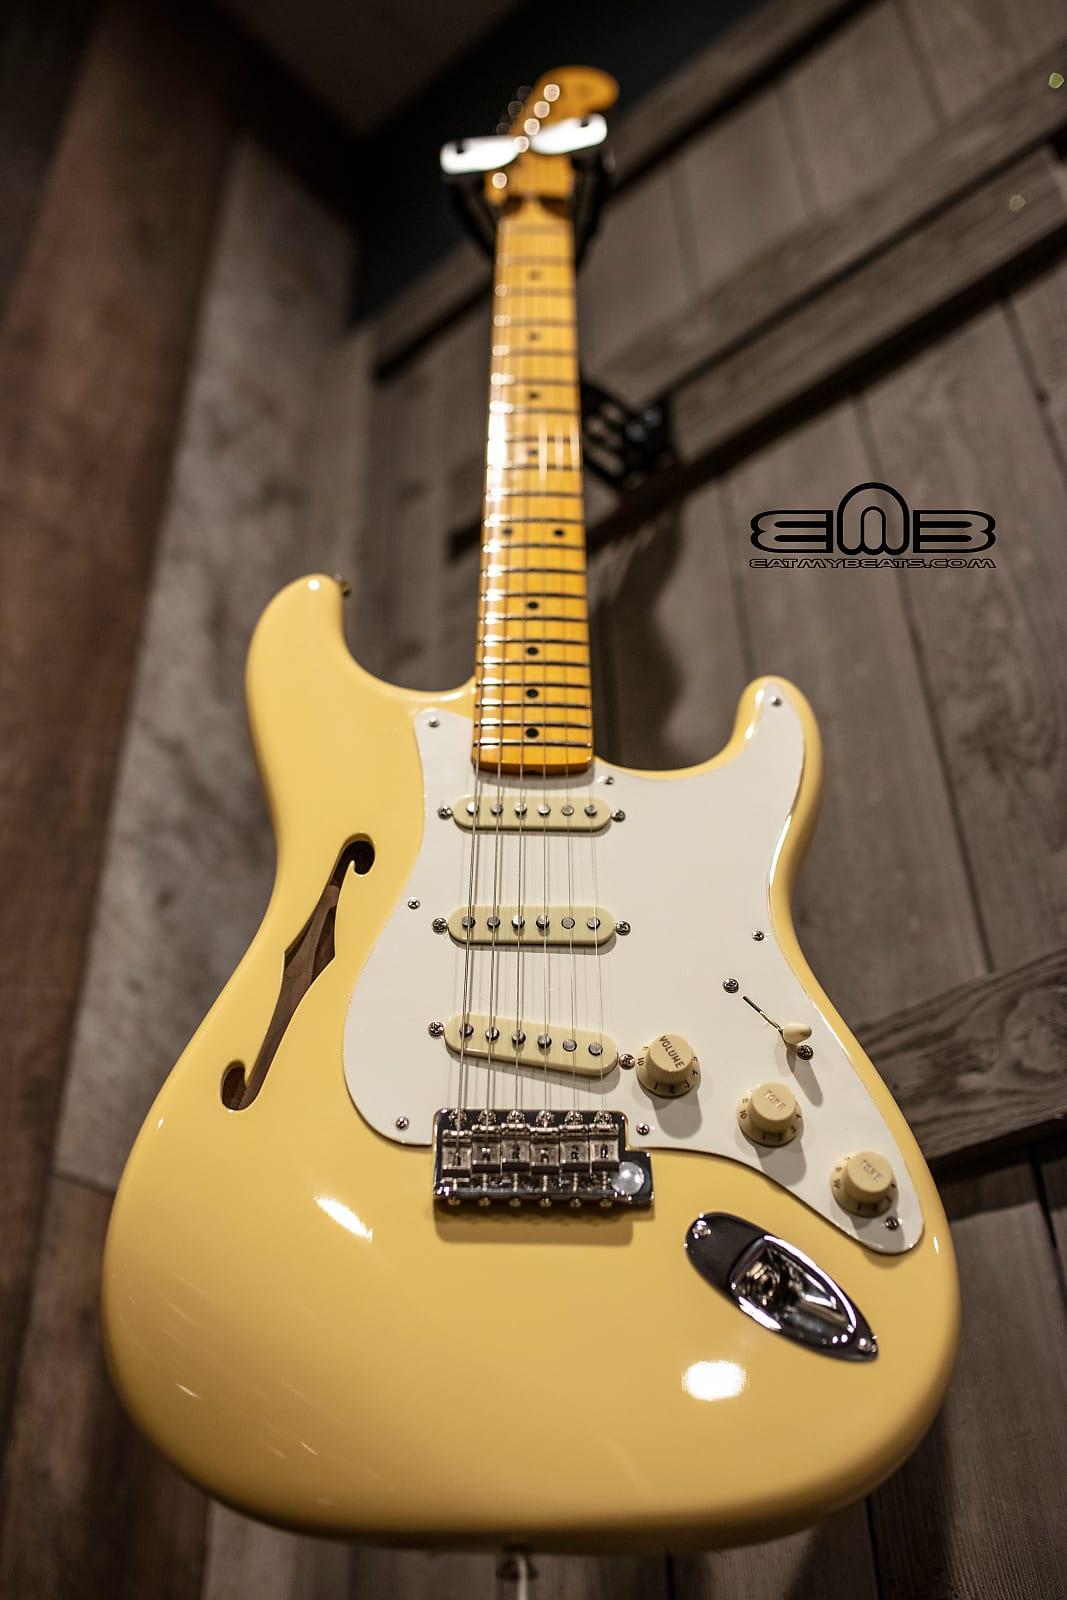 Fender 0113602741 ERIC JOHNSON SIGNATURE STRATOCASTER® THINLINE - Ships FREE Lower 48 States!